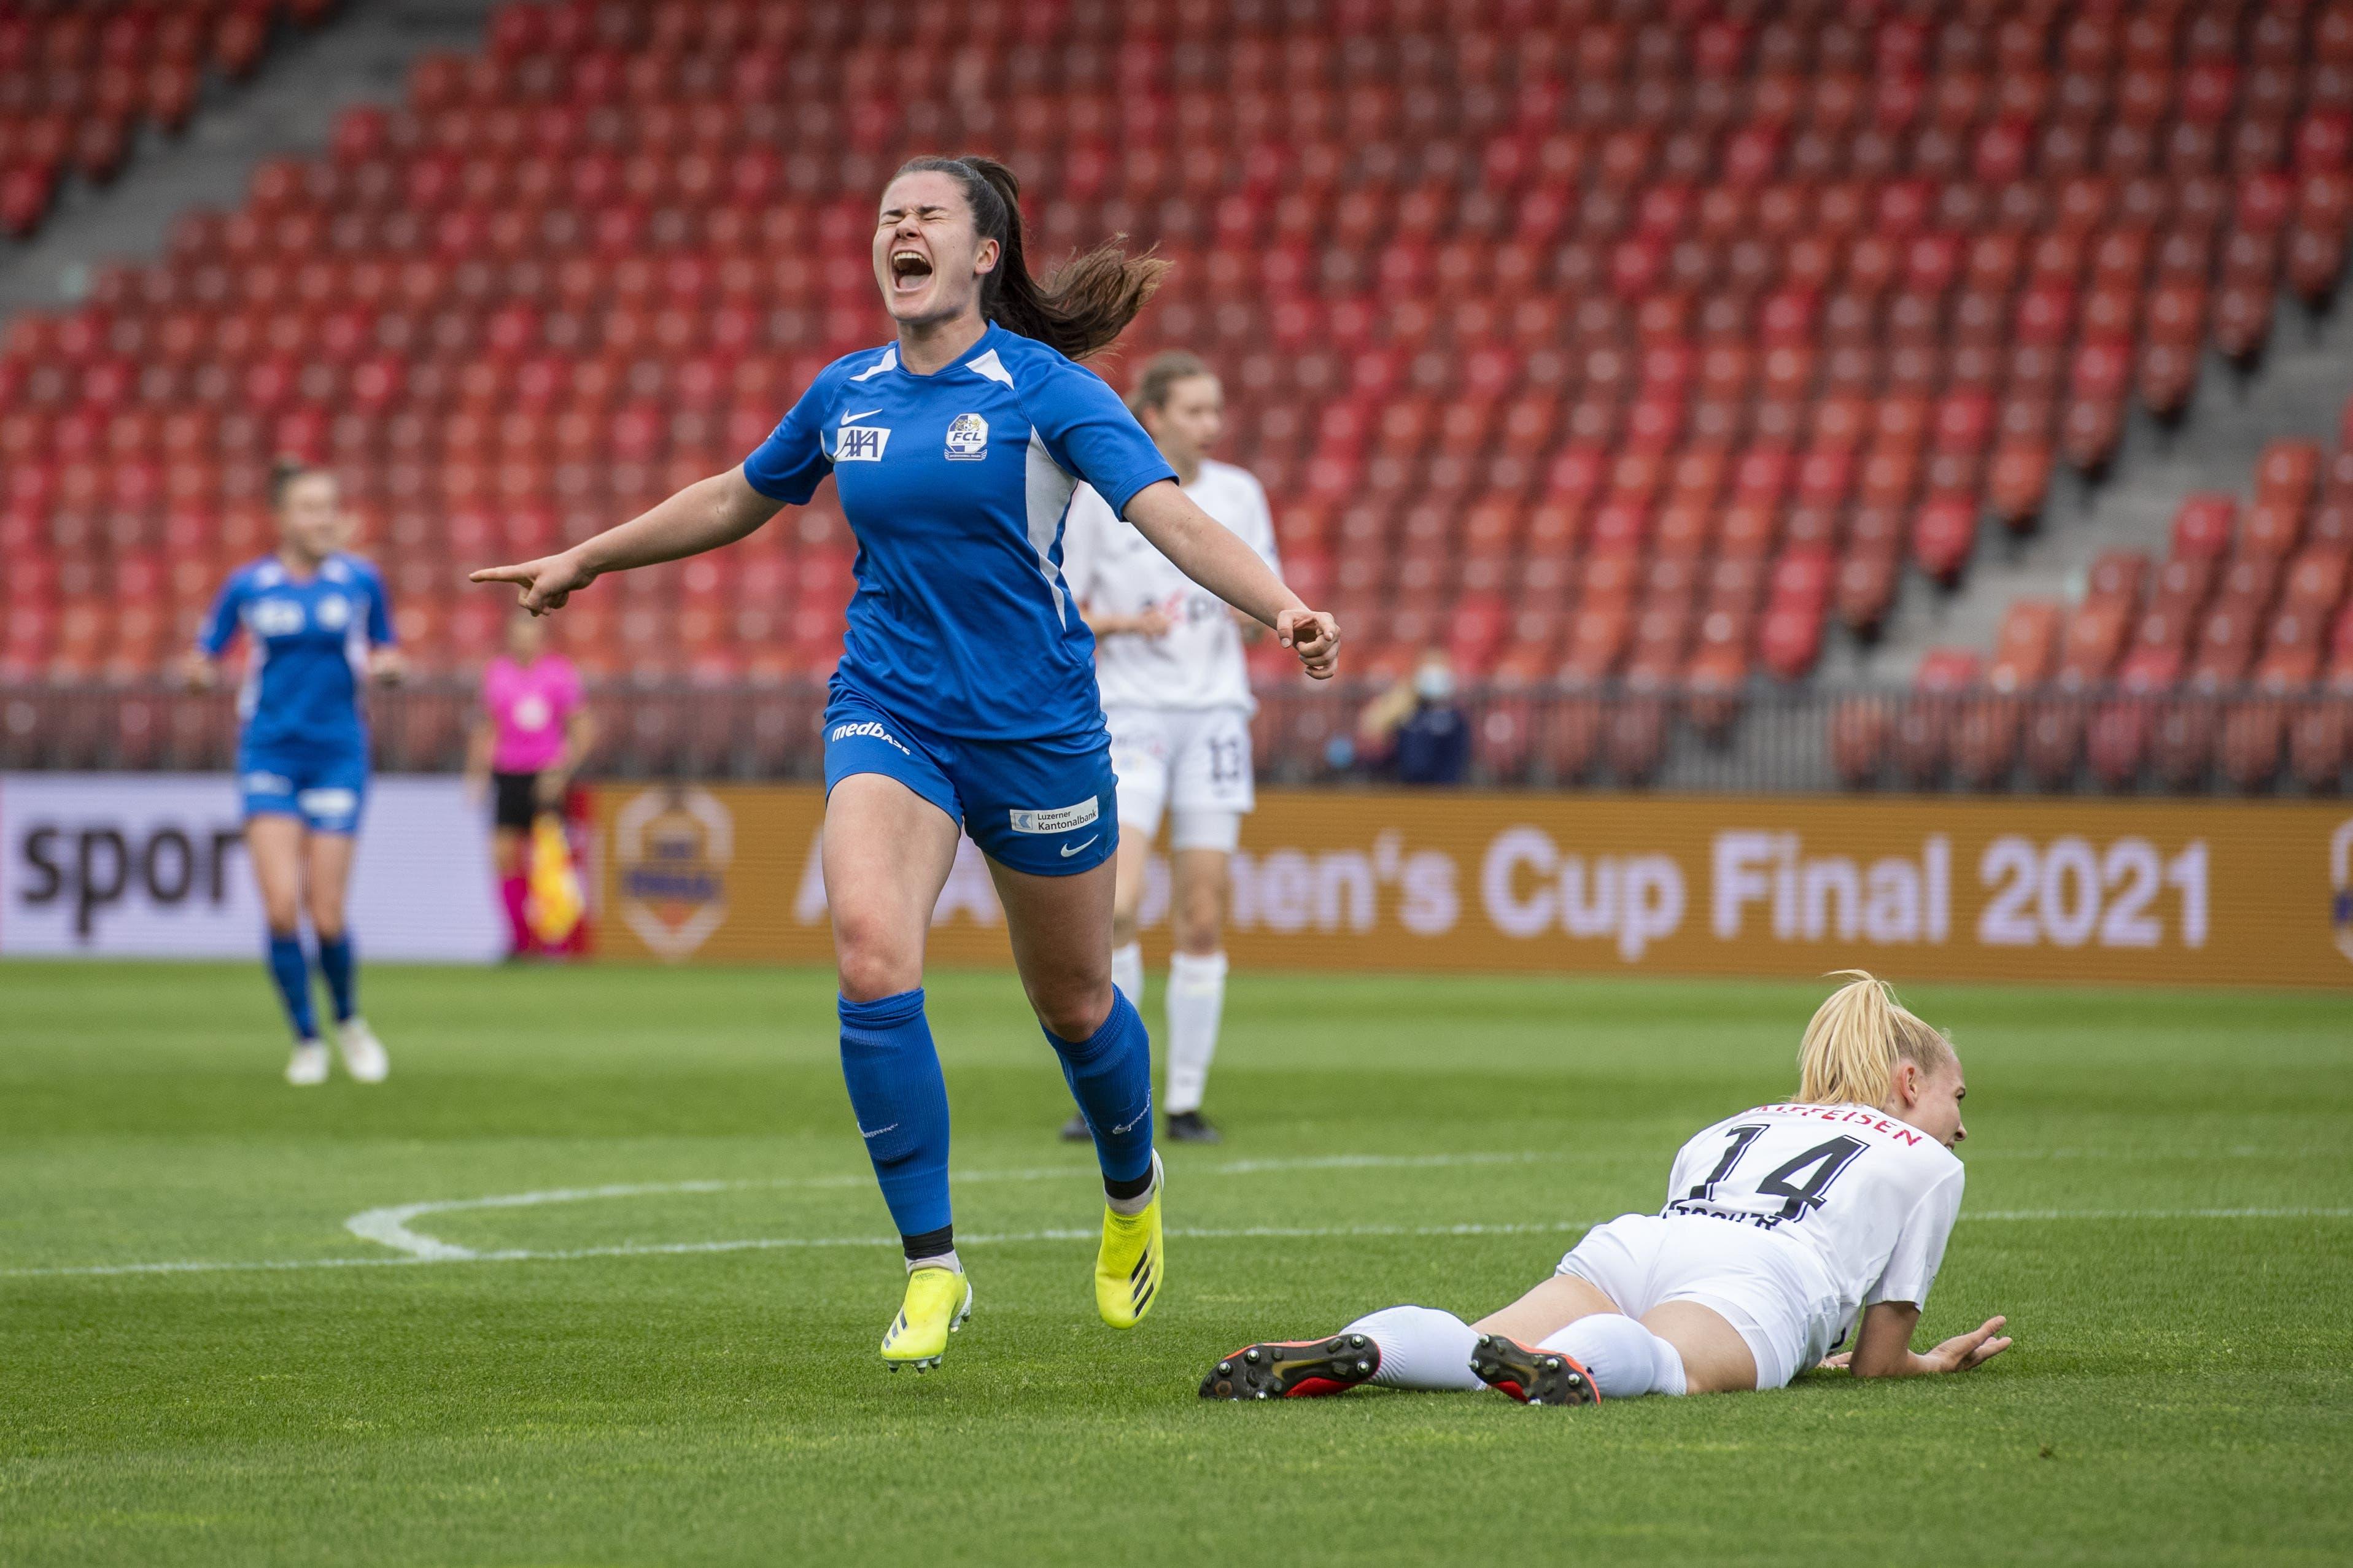 Svenja Fölmli feiert ihr Tor zum 1:0.